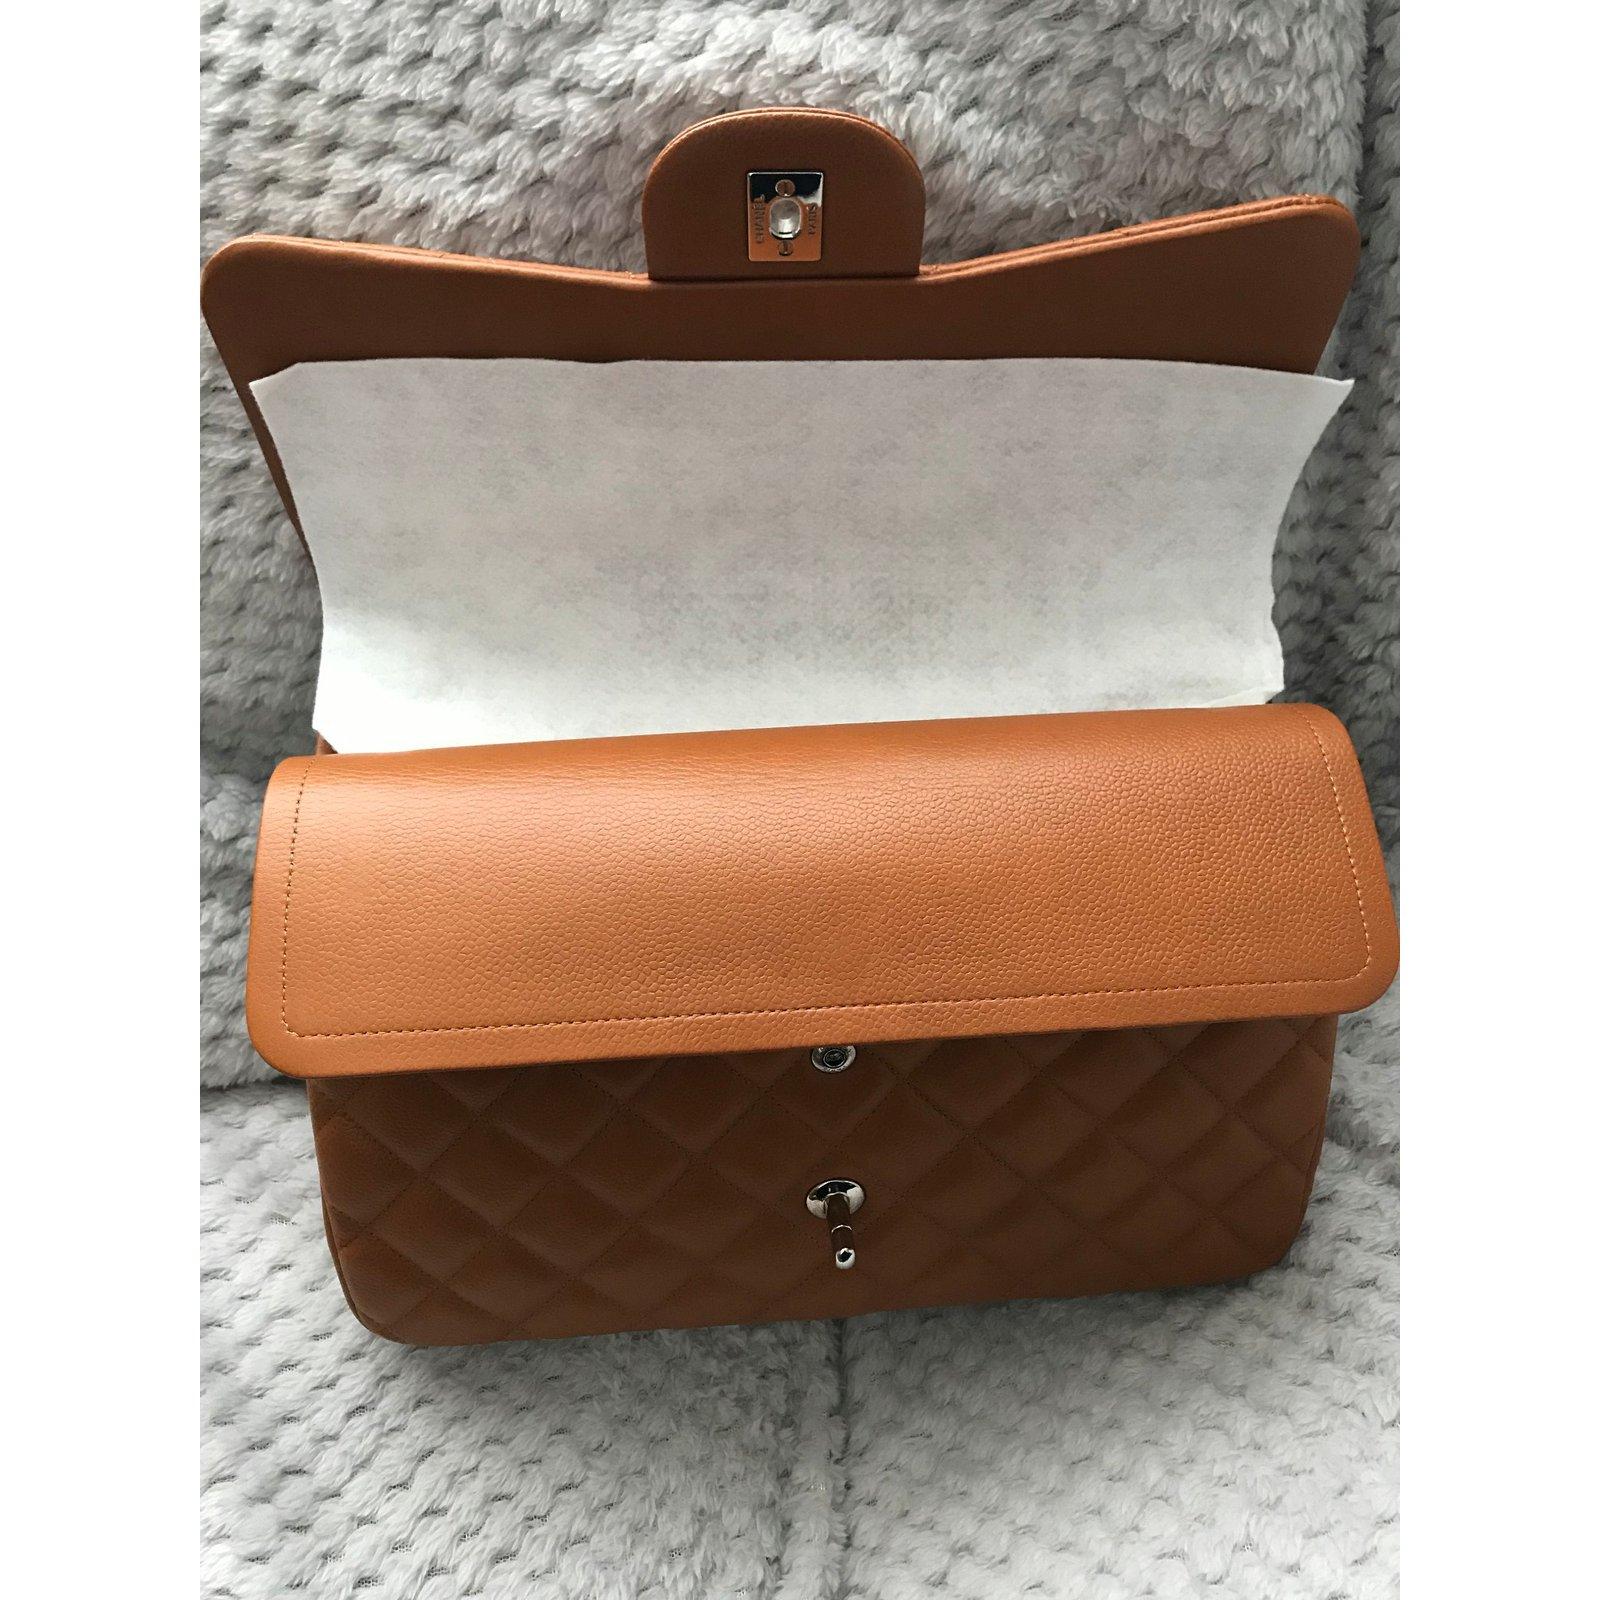 f63ddfbd9788 Chanel Chanel Jumbo Timeless Classic lined Flap Bag - Caviar leather - Rich  Caramel Handbags Leather Caramel ref.71926 - Joli Closet